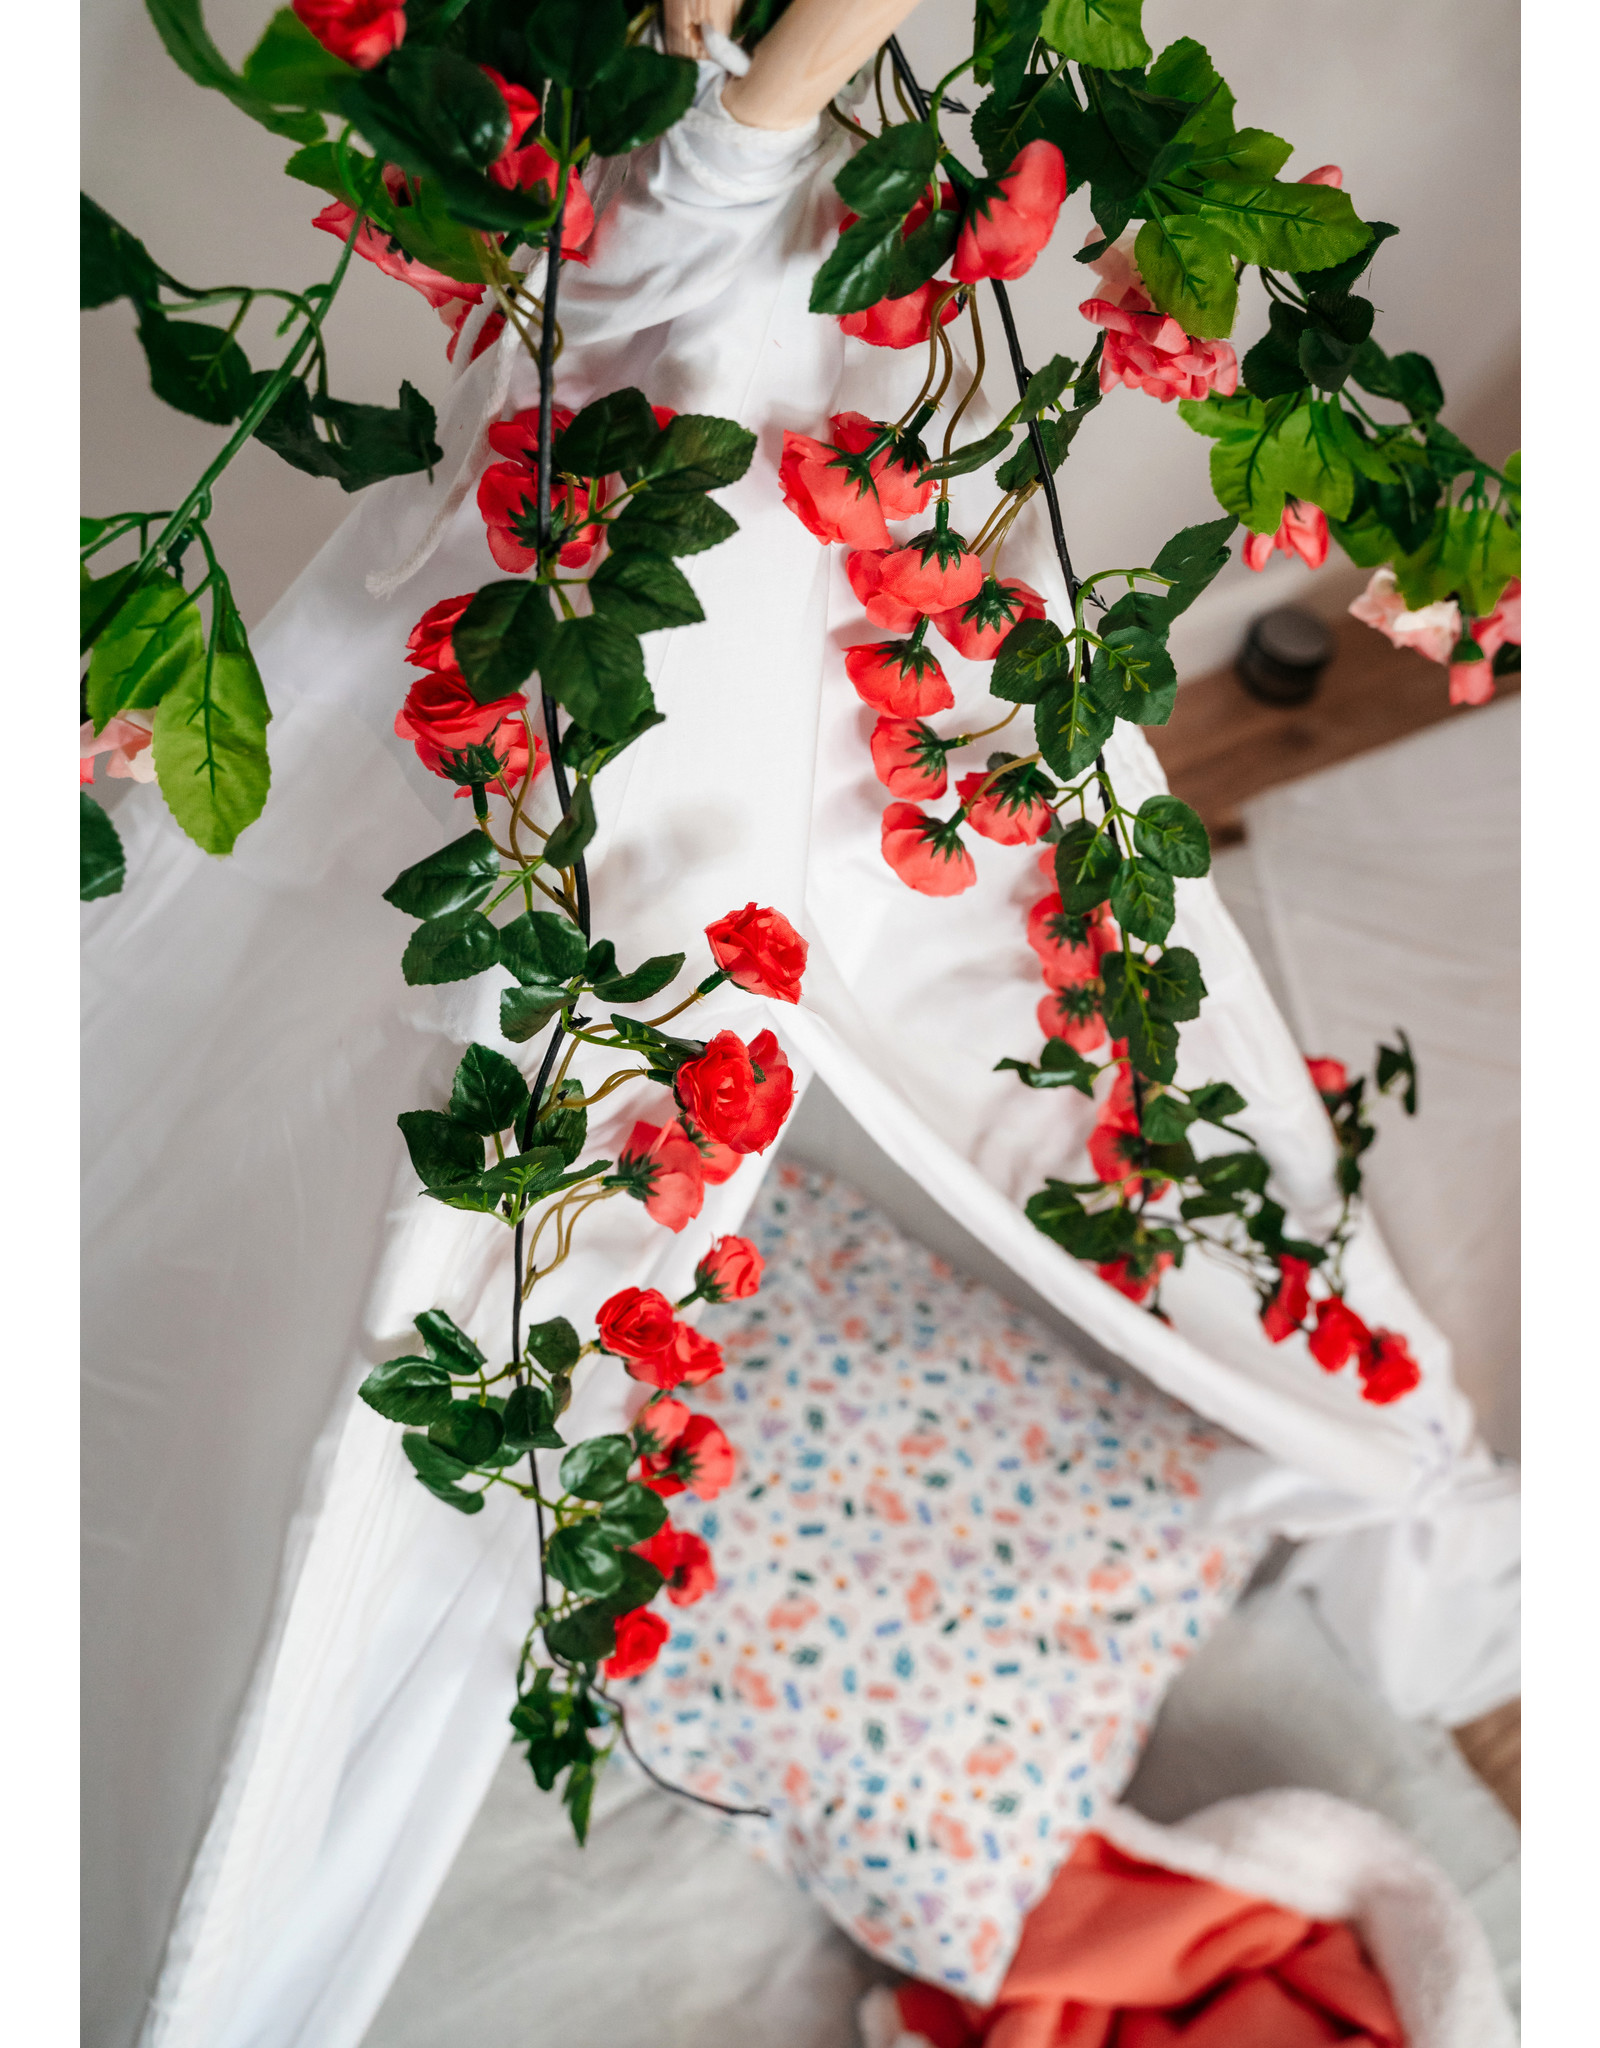 Slaapfeestjes: Flowers